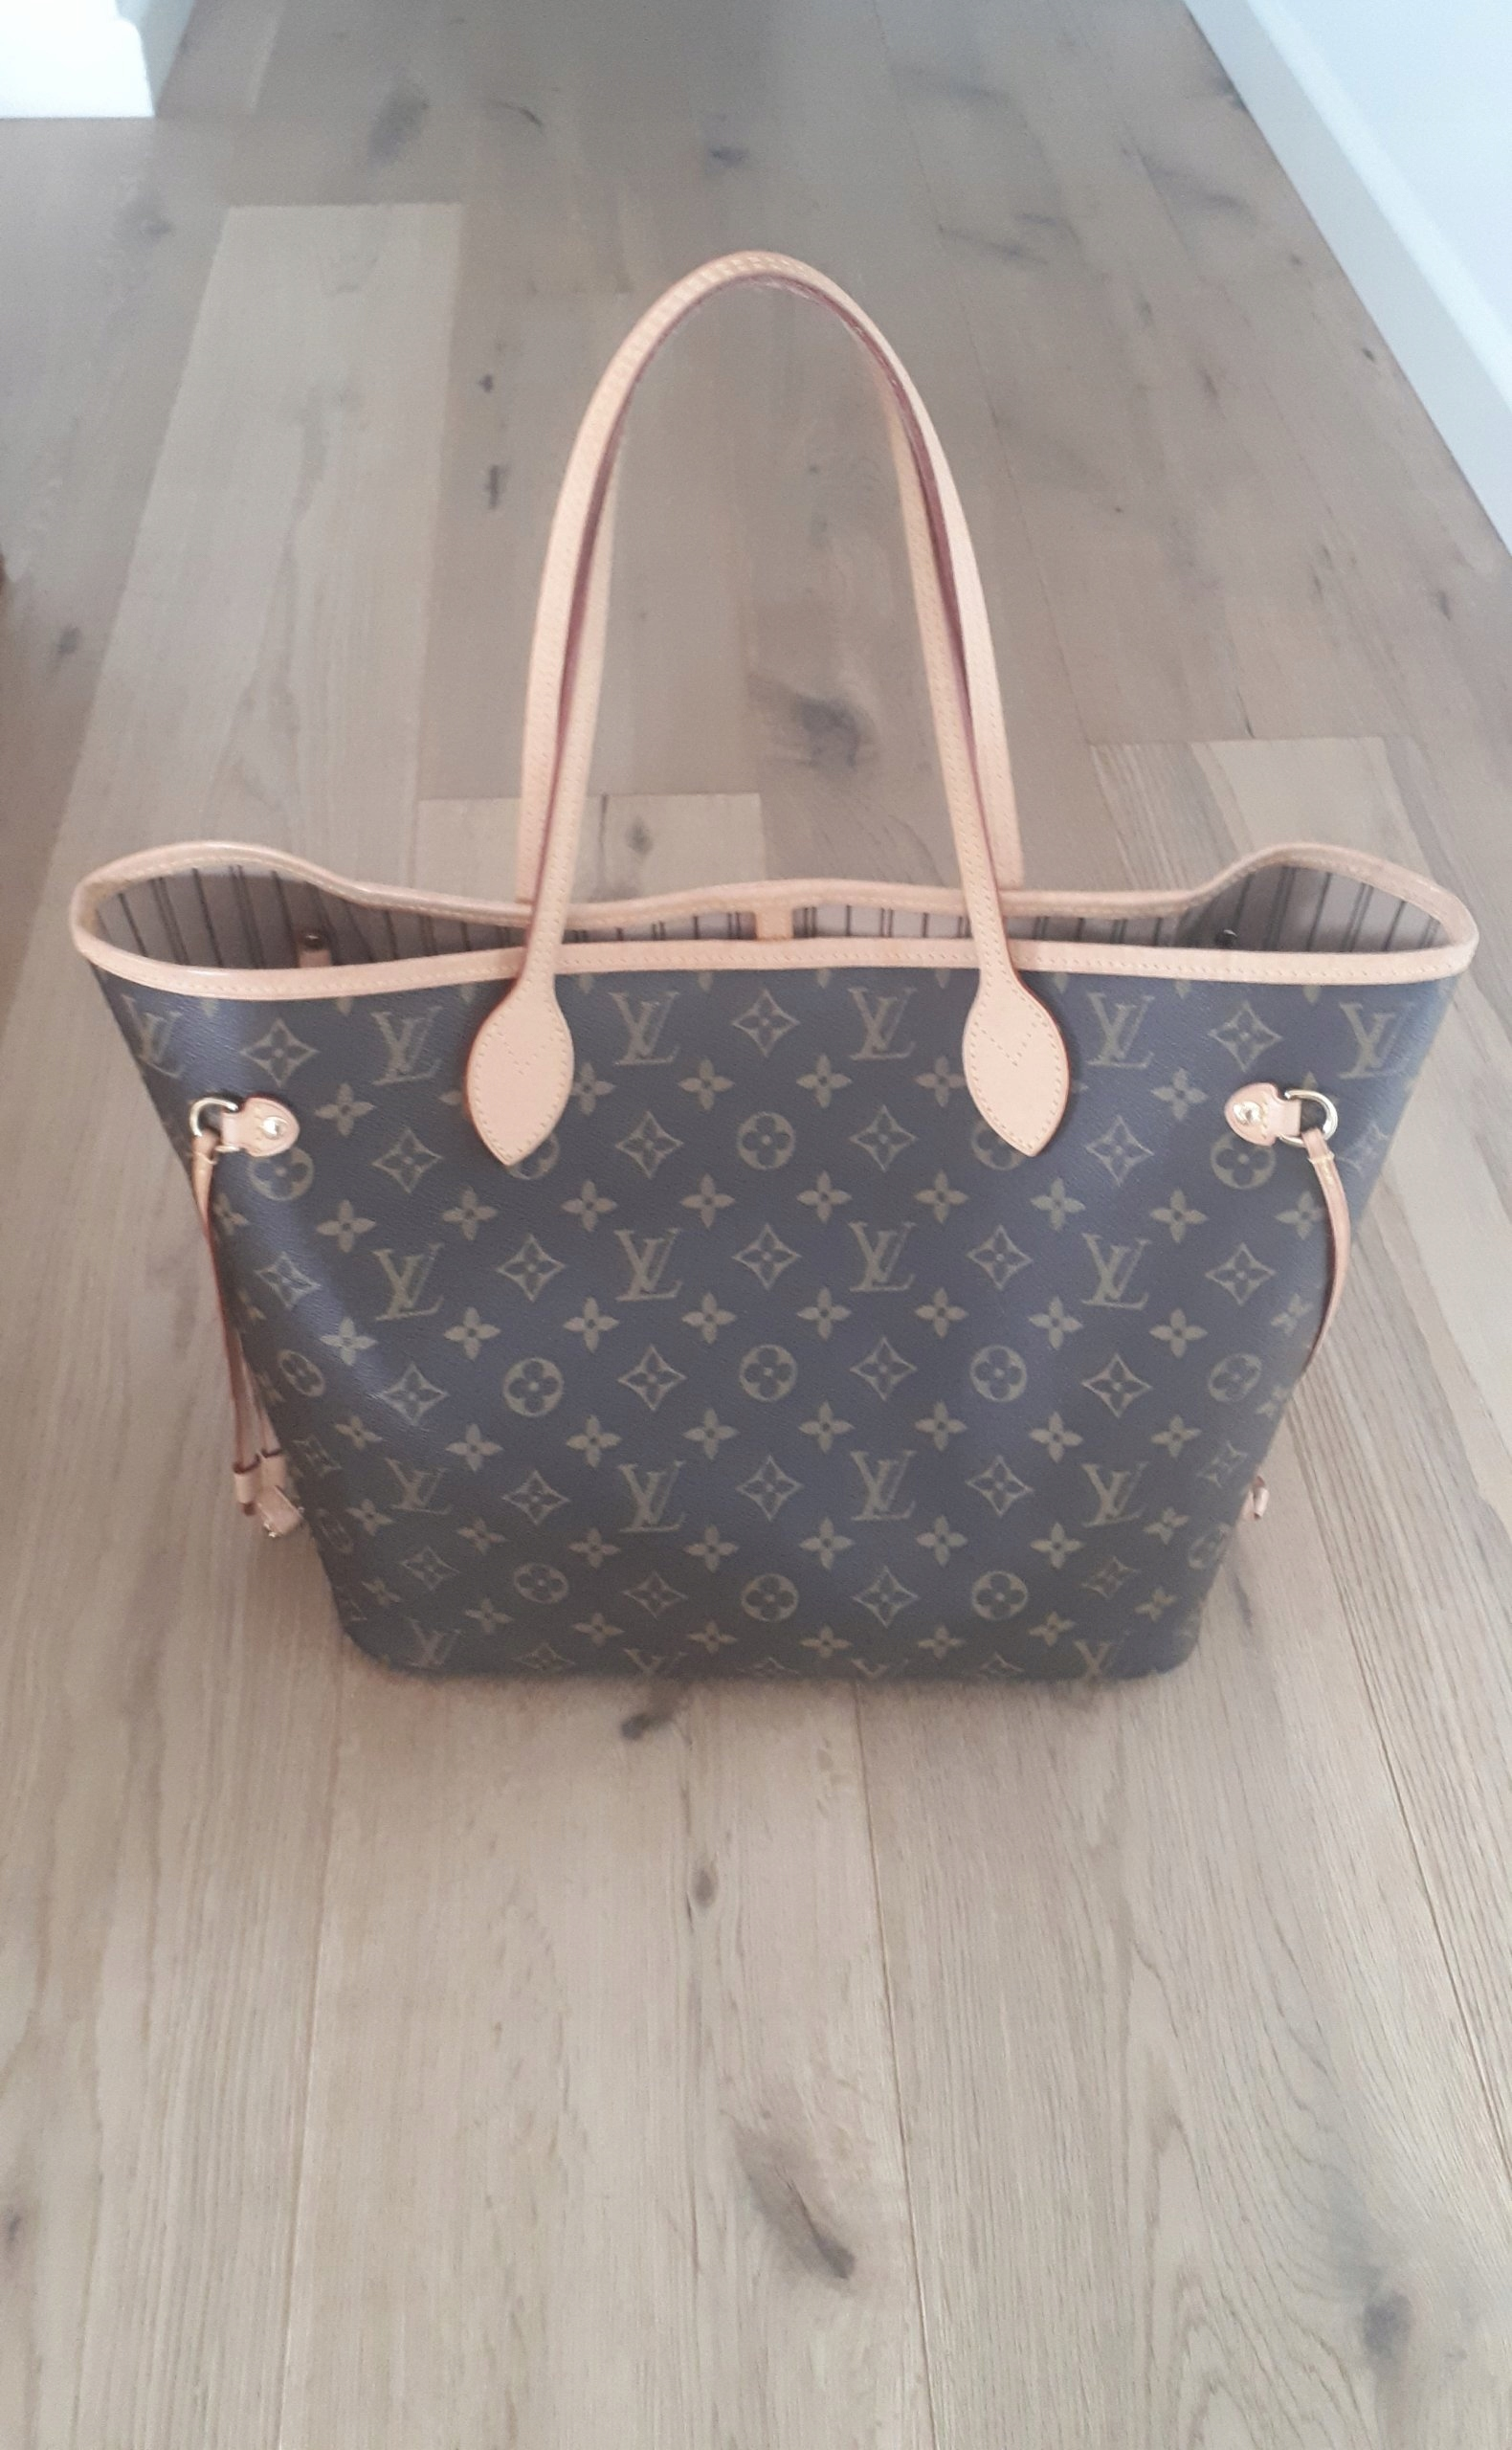 acd64b01804c5 Torebka Louis Vuitton Neverfull MM nowa piękna - 7419141863 ...